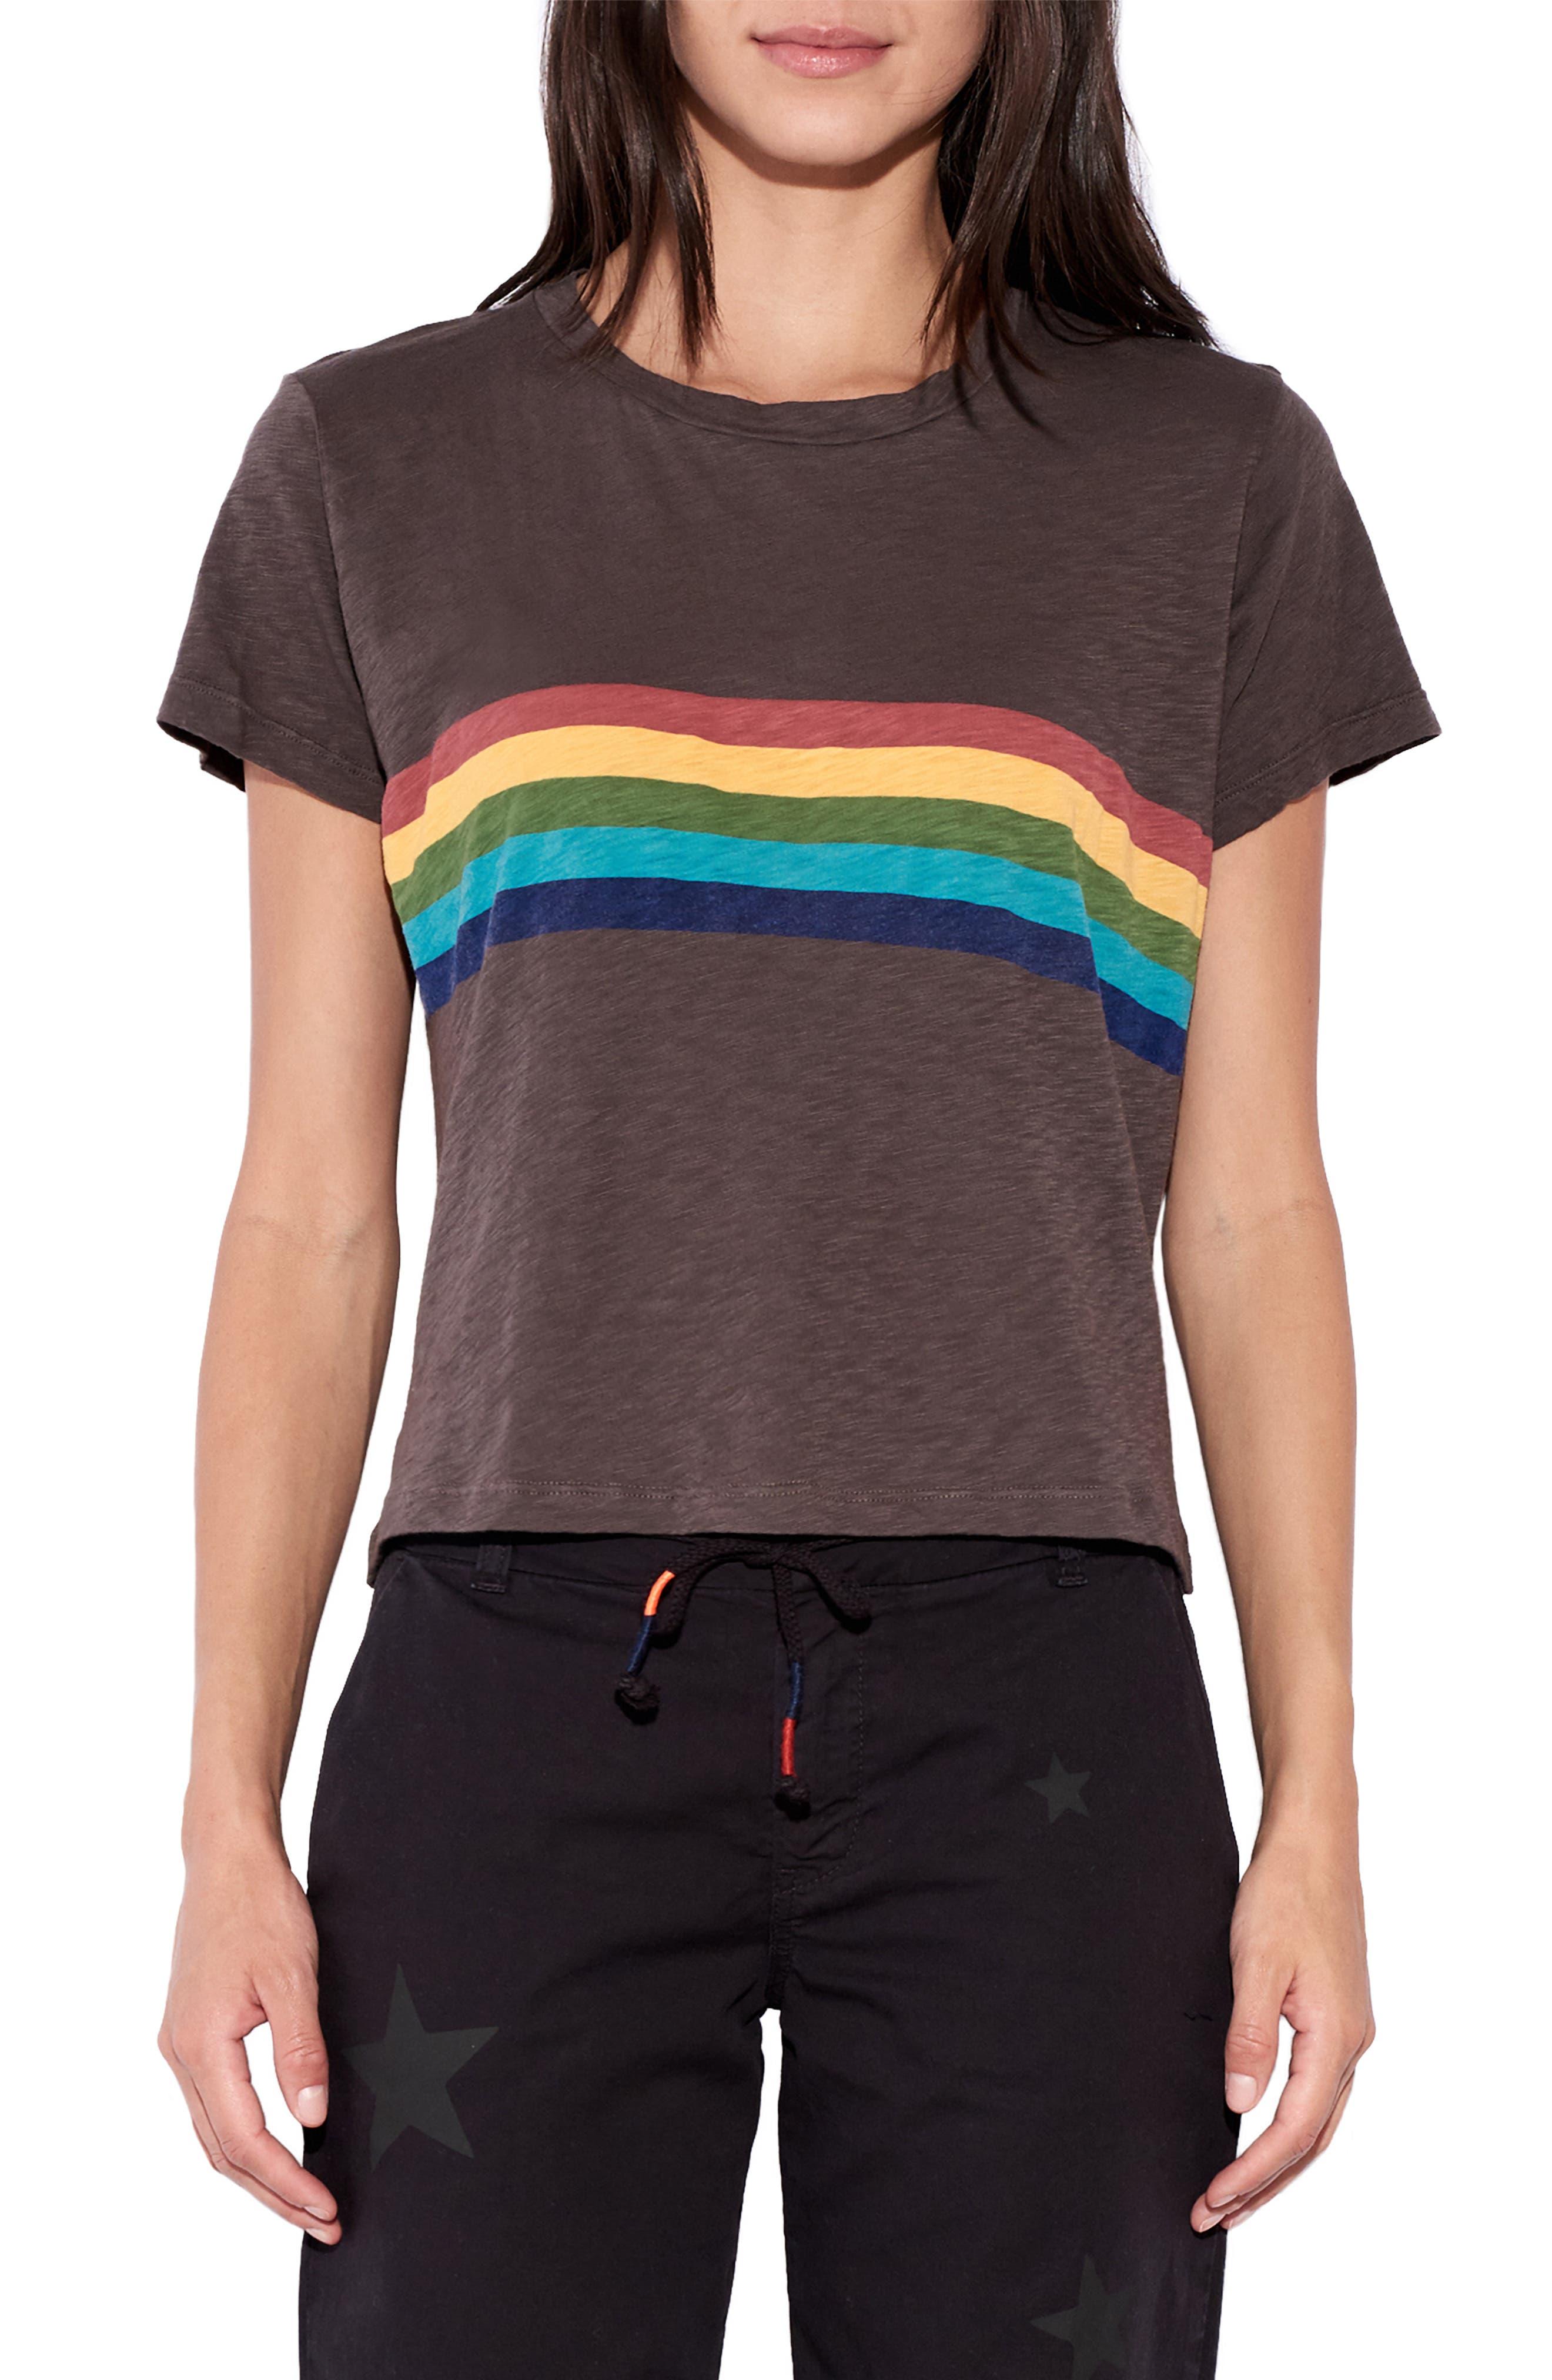 Women's 70s Shirts, Blouses, Hippie Tops Womens Sundry Rainbow Stripe Tee $78.00 AT vintagedancer.com